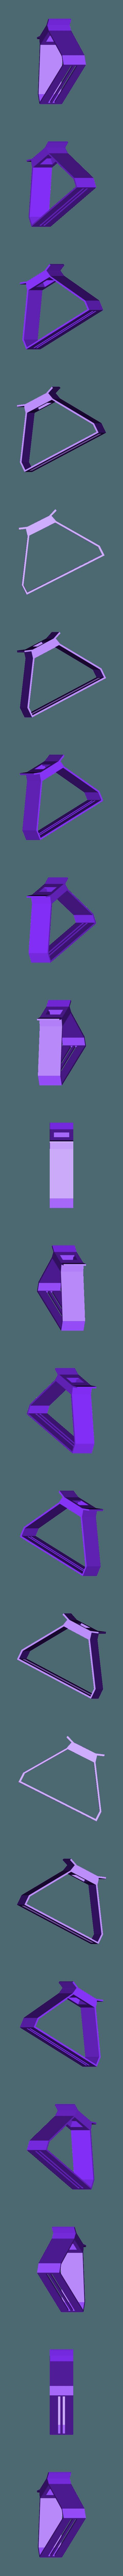 picus lamp4 by ctrl design.stl Download free STL file LED LIGHT • 3D printer model, Byctrldesign